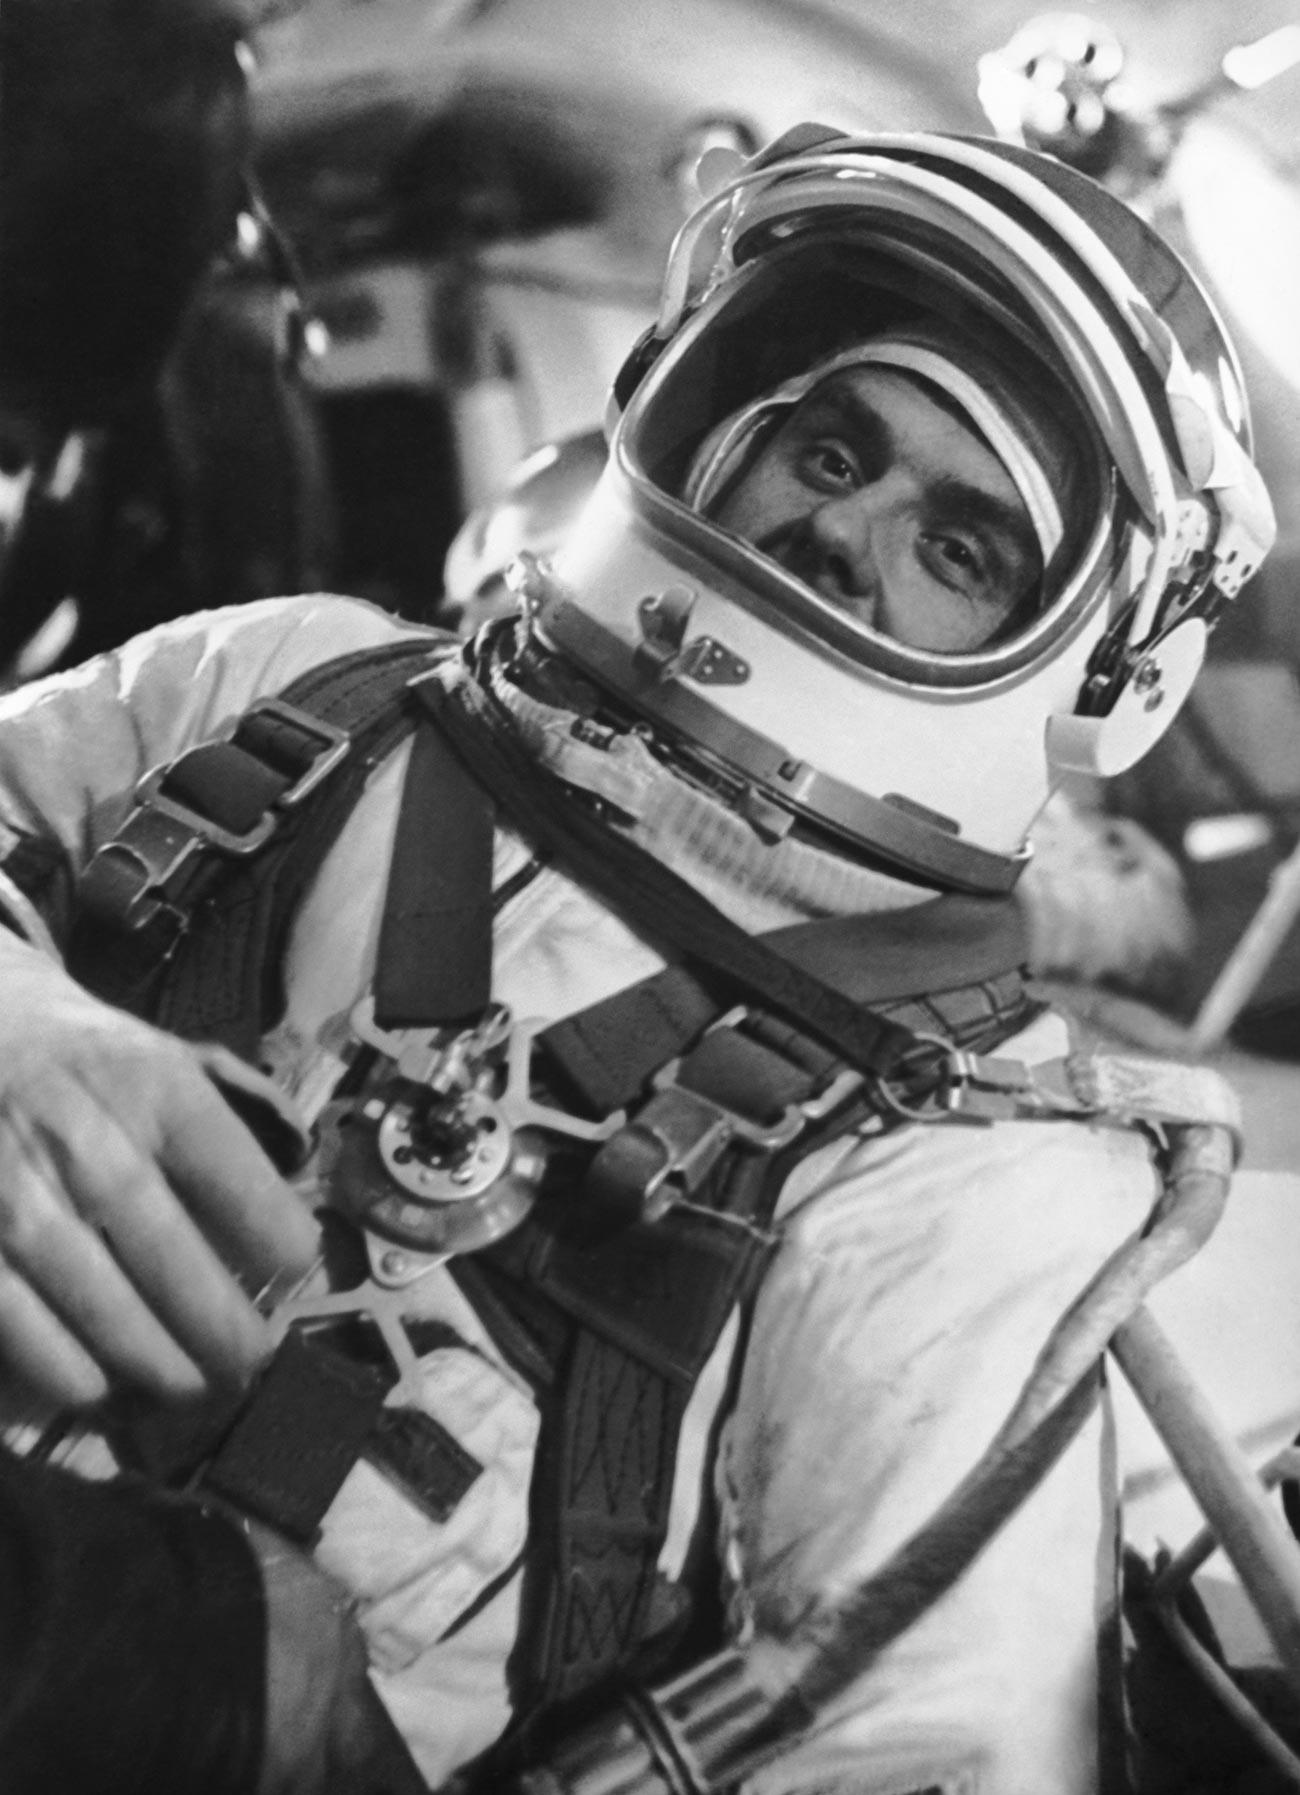 Colonel Vladimir Komarov preparing for the flight.